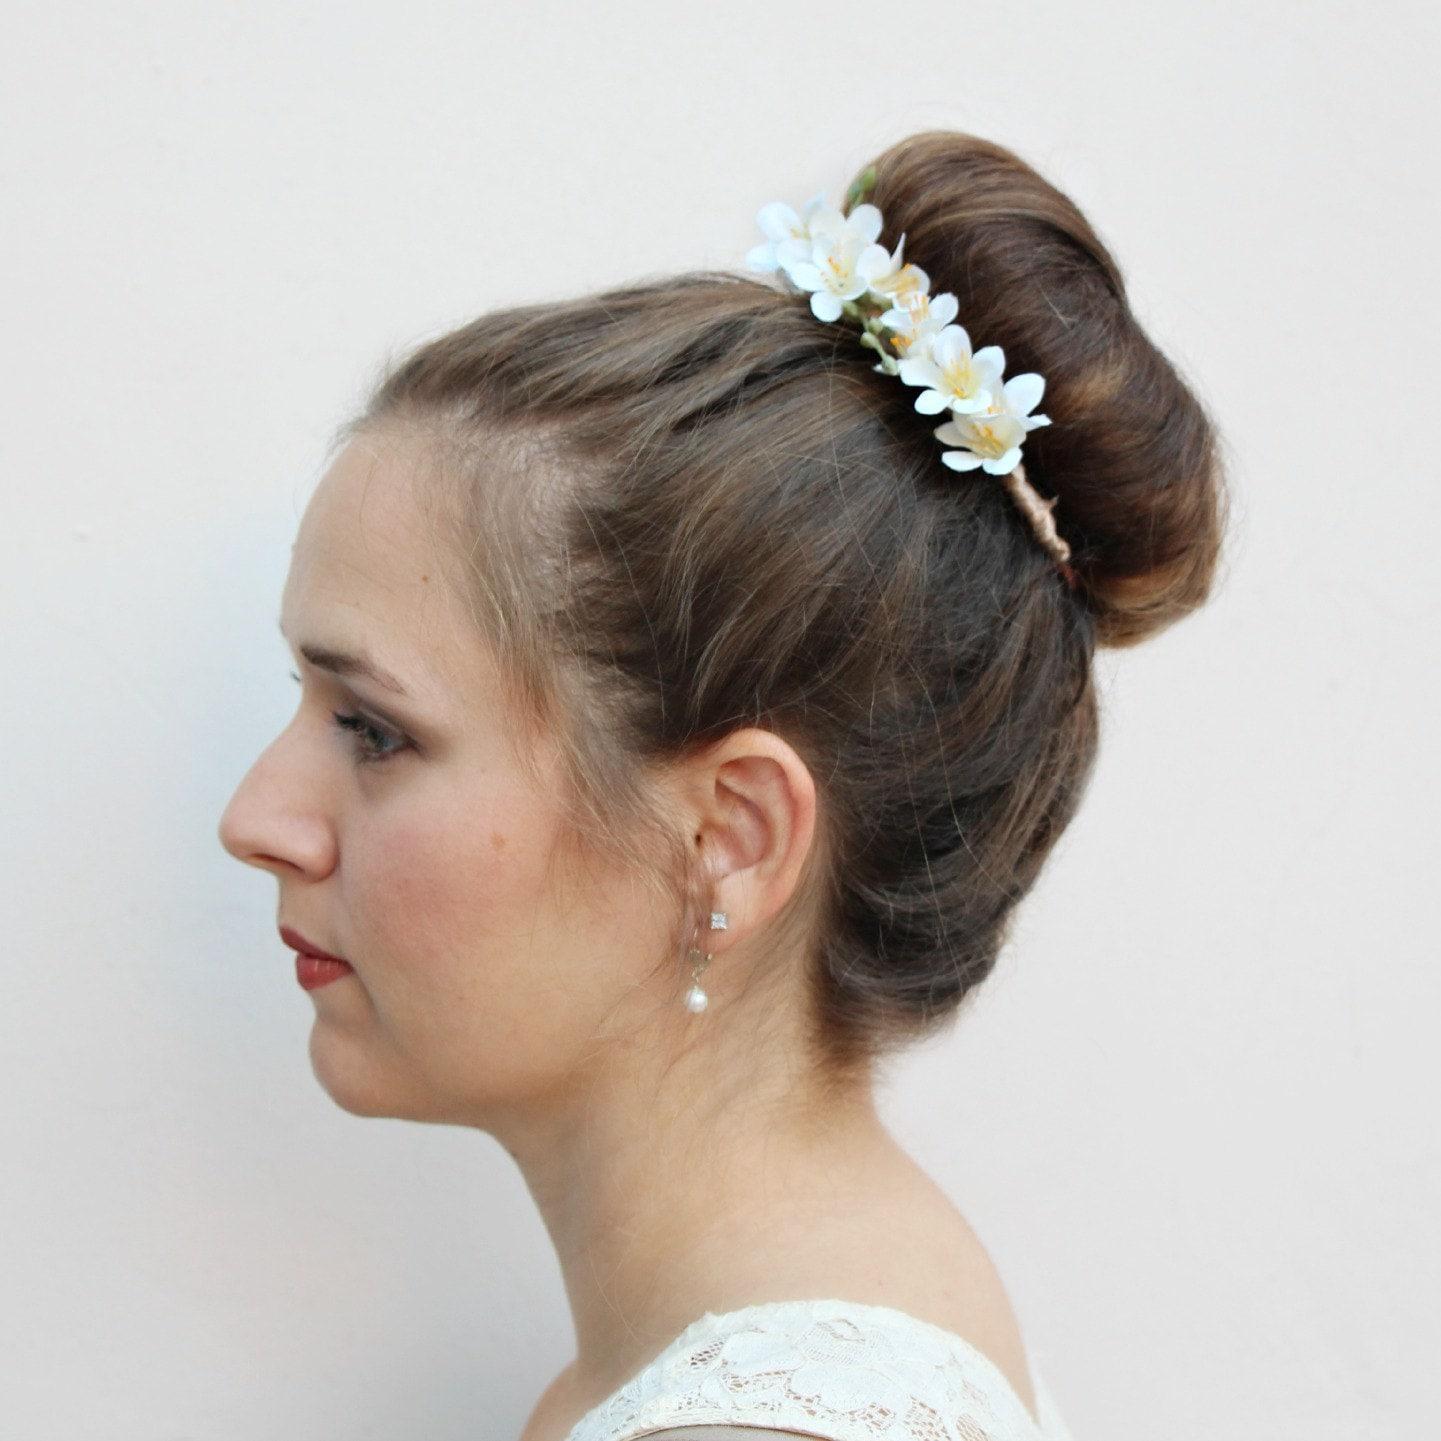 Liliana Floral Bun Belt Flower Crown For Your Hair Bun Coachella